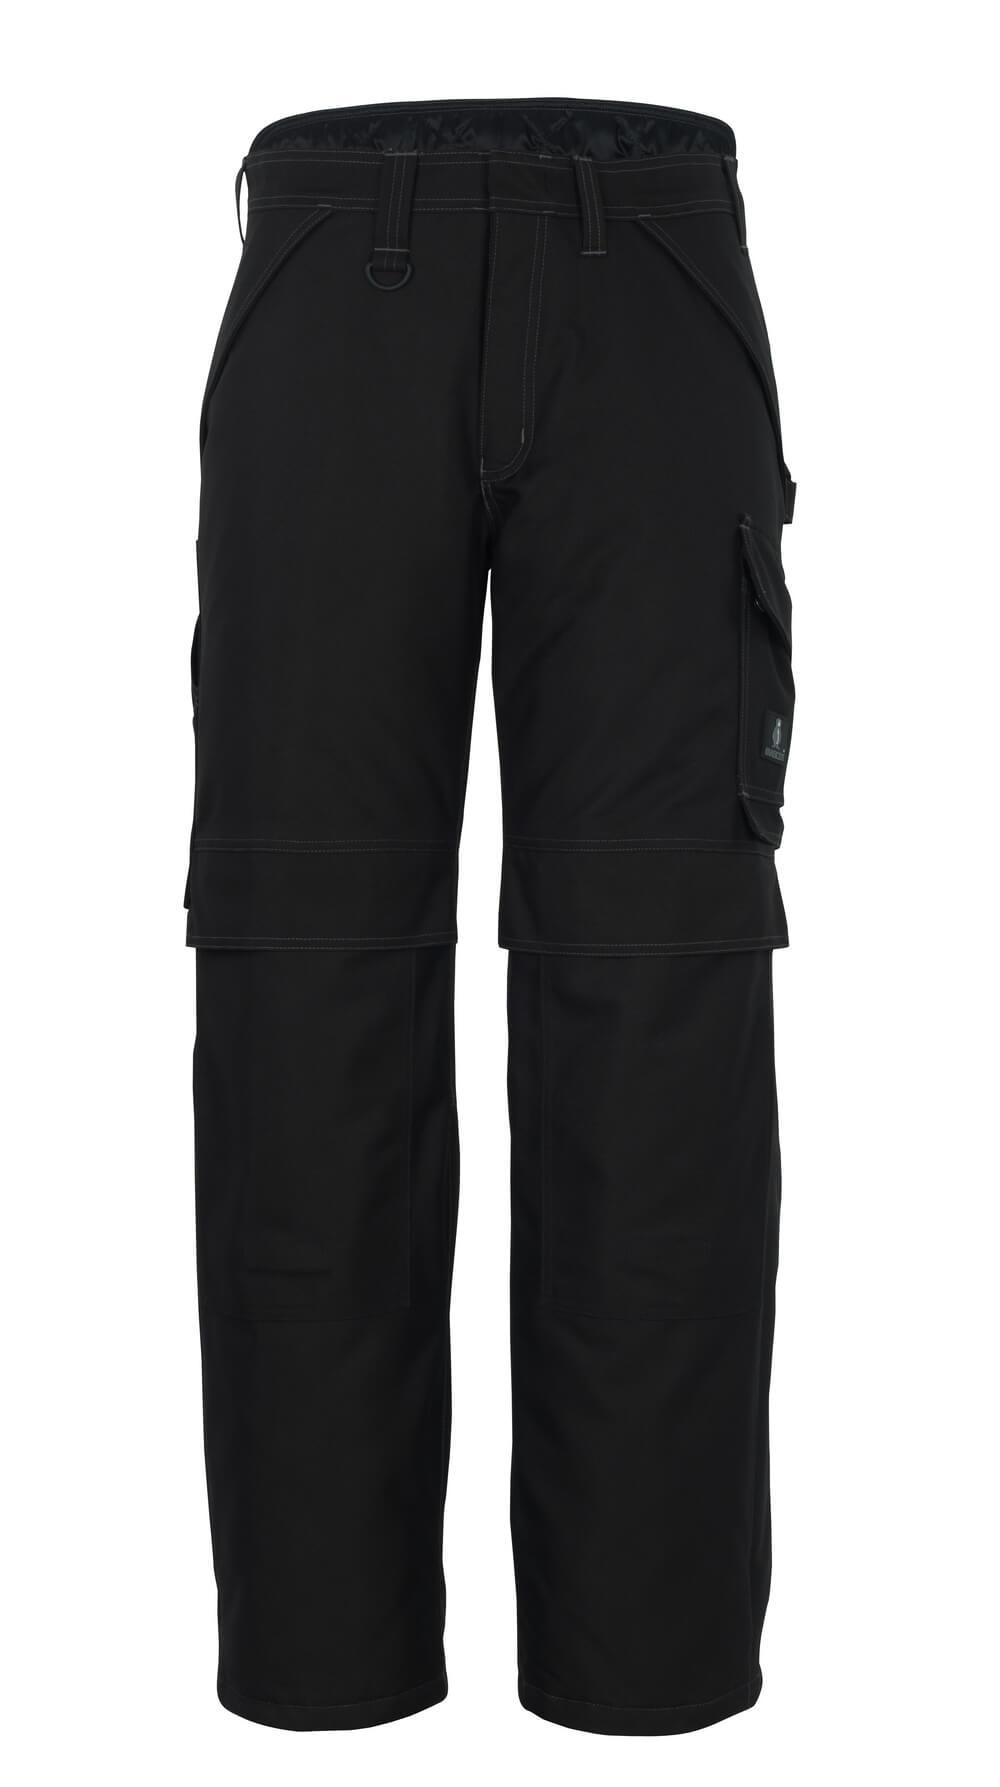 10090-194-09 Winterbroek - zwart